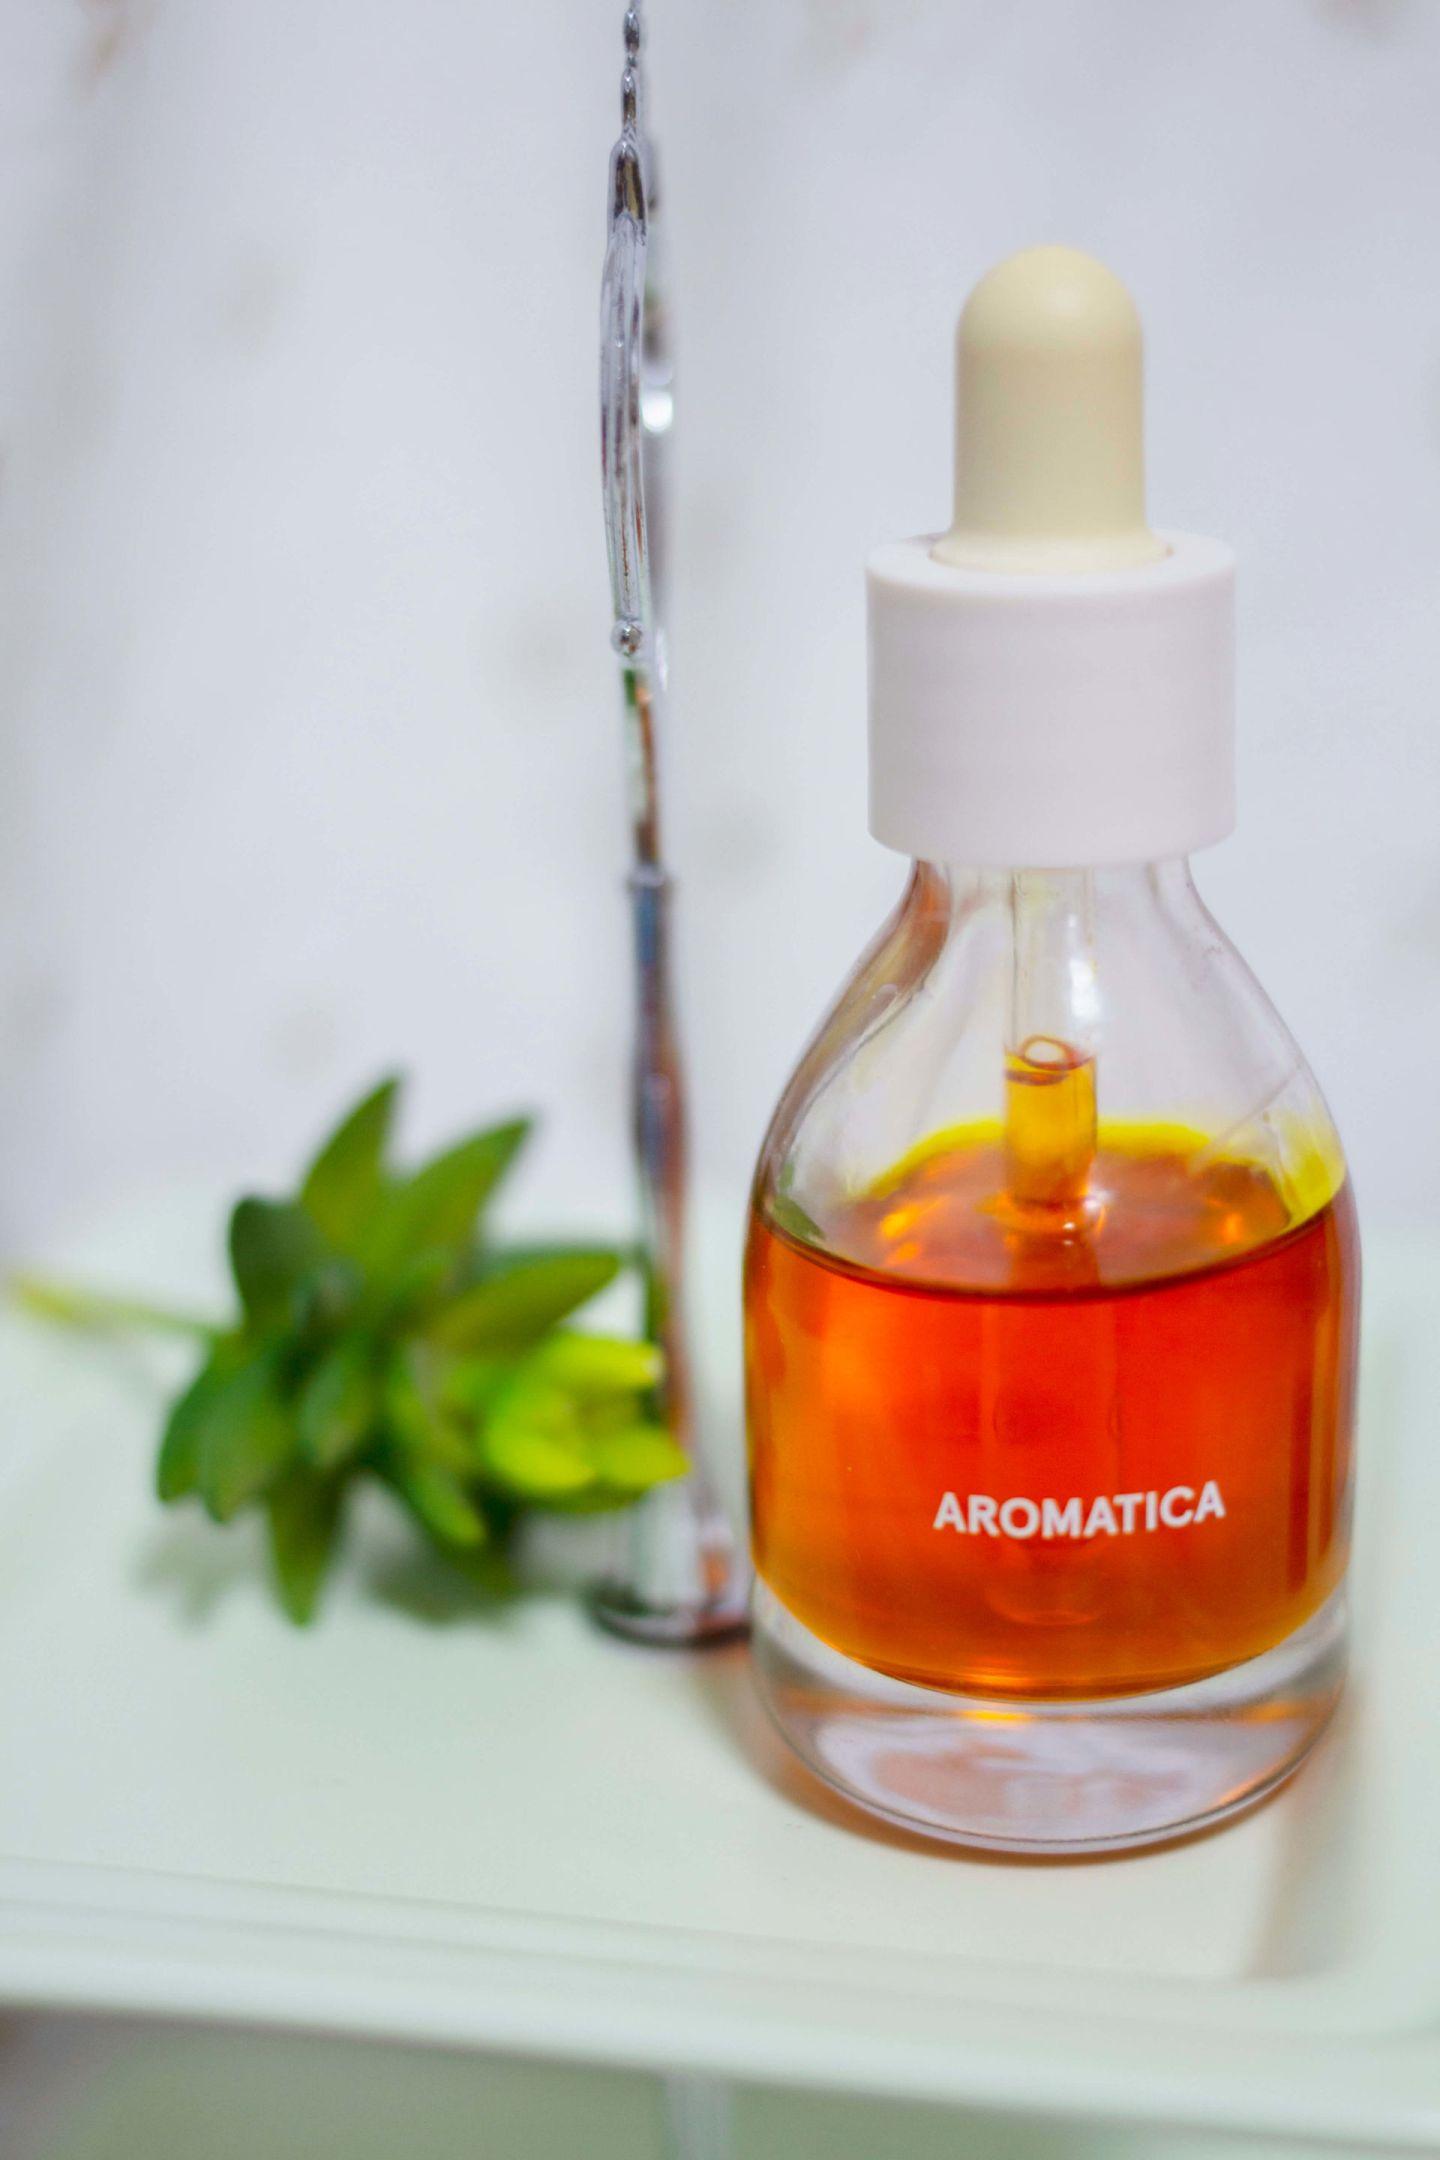 aromatica cold pressed rose hip oil